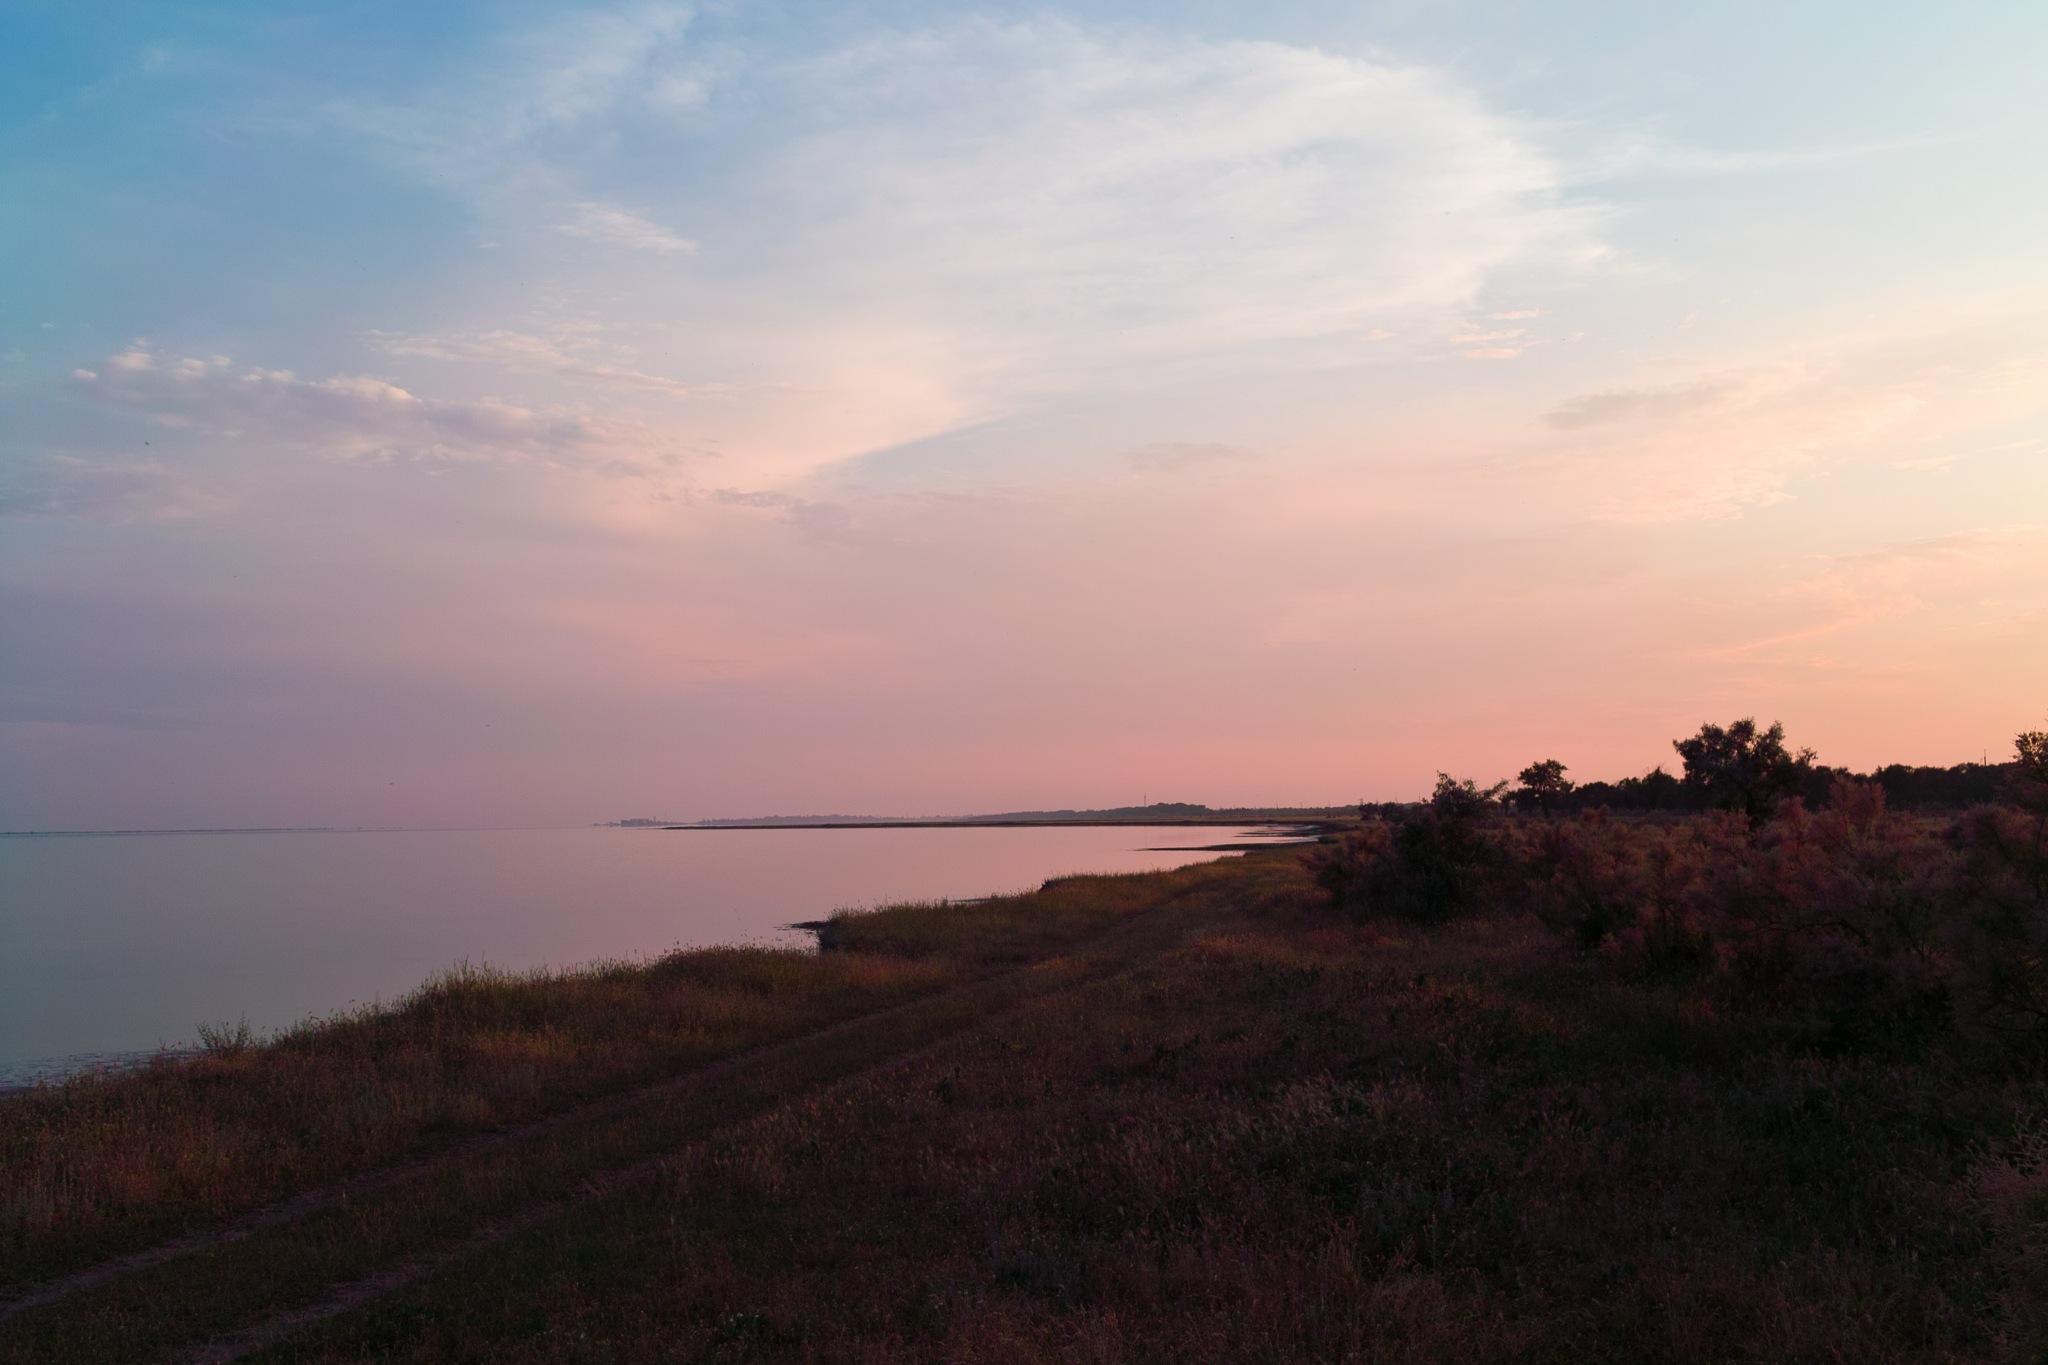 Sunset on the sea by DimaShevchuk